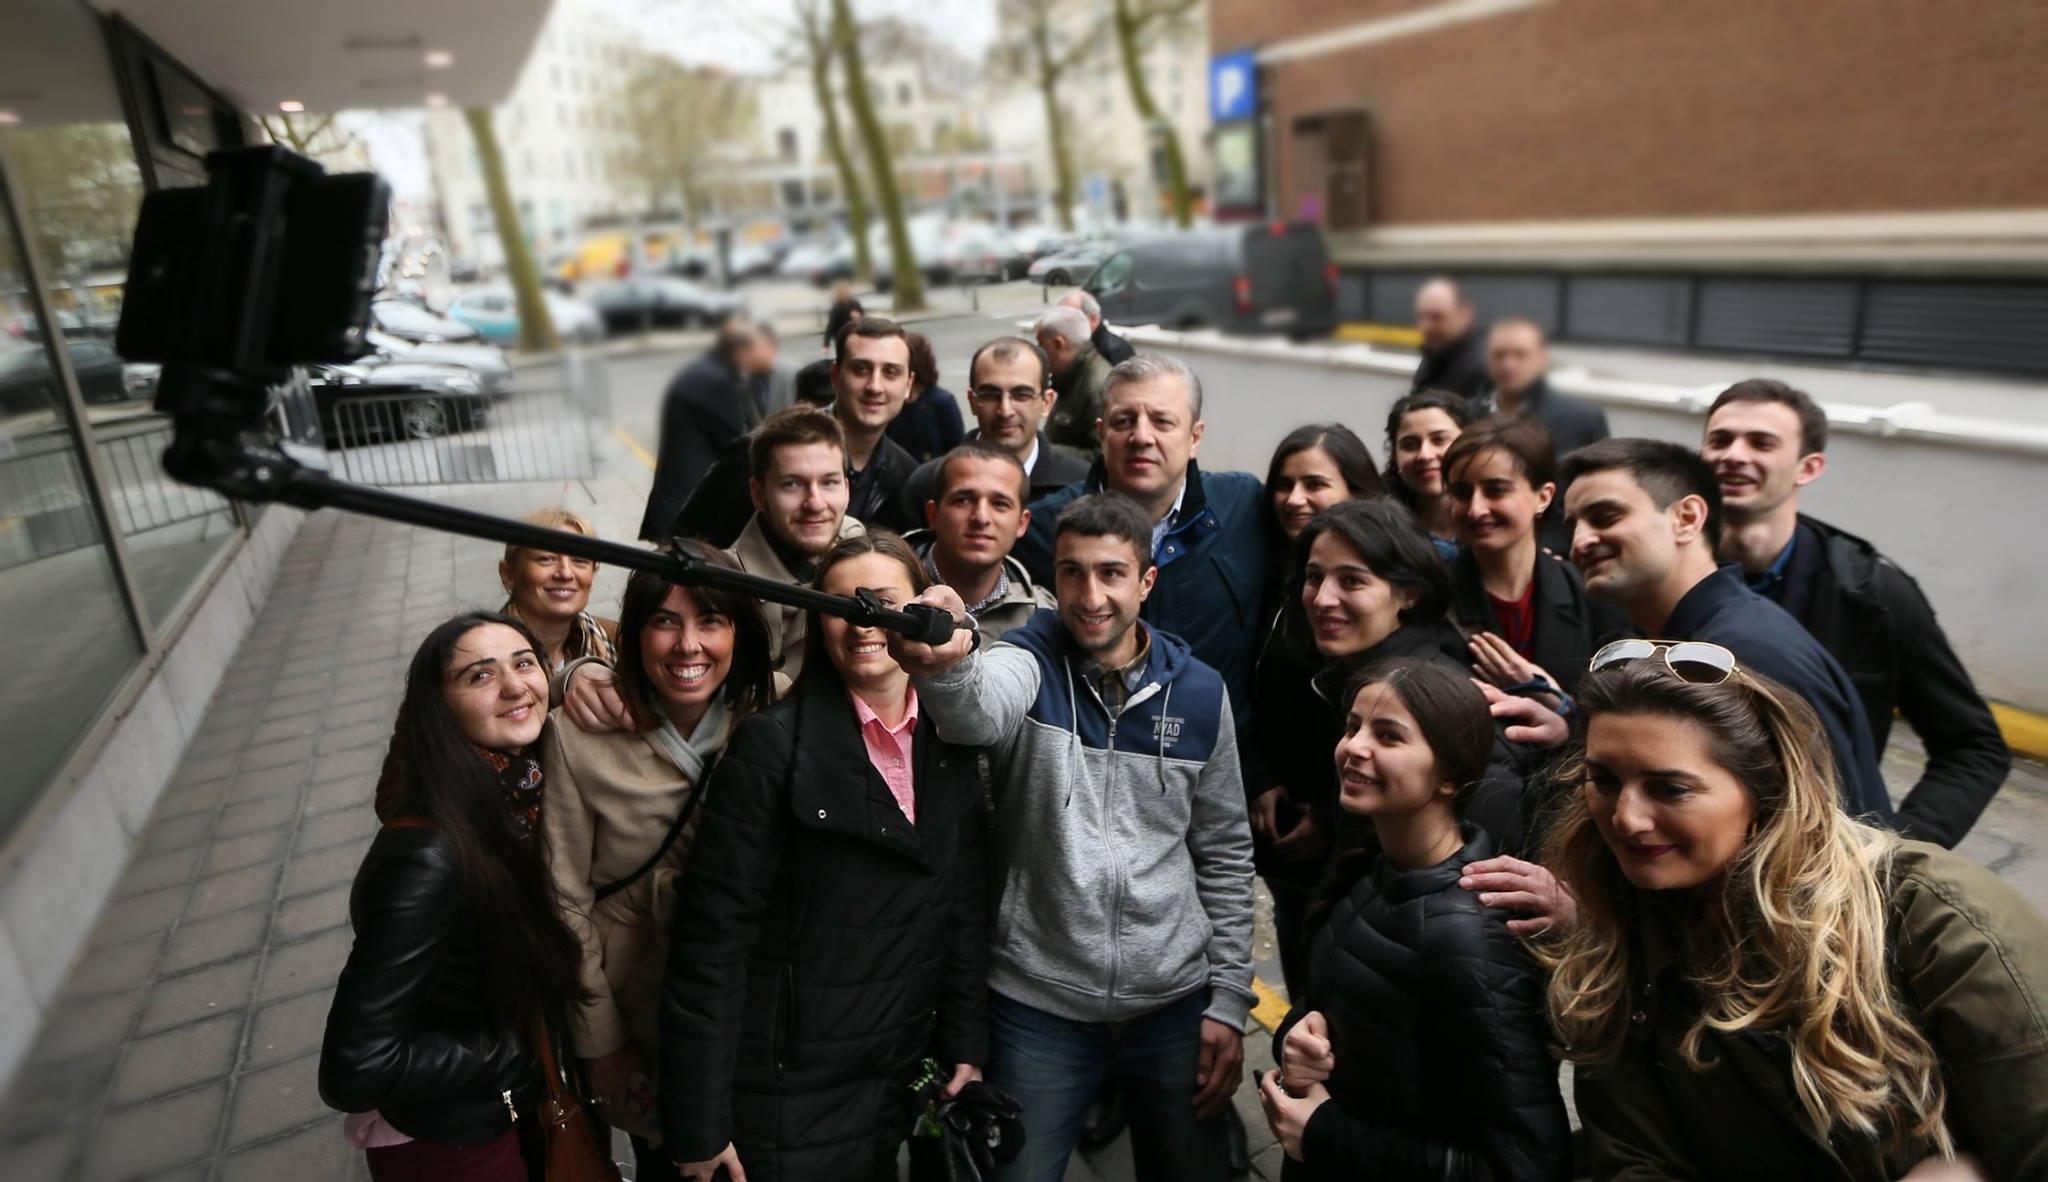 Georgians Fear Visa-Free Travel to Europe in Jeopardy ...